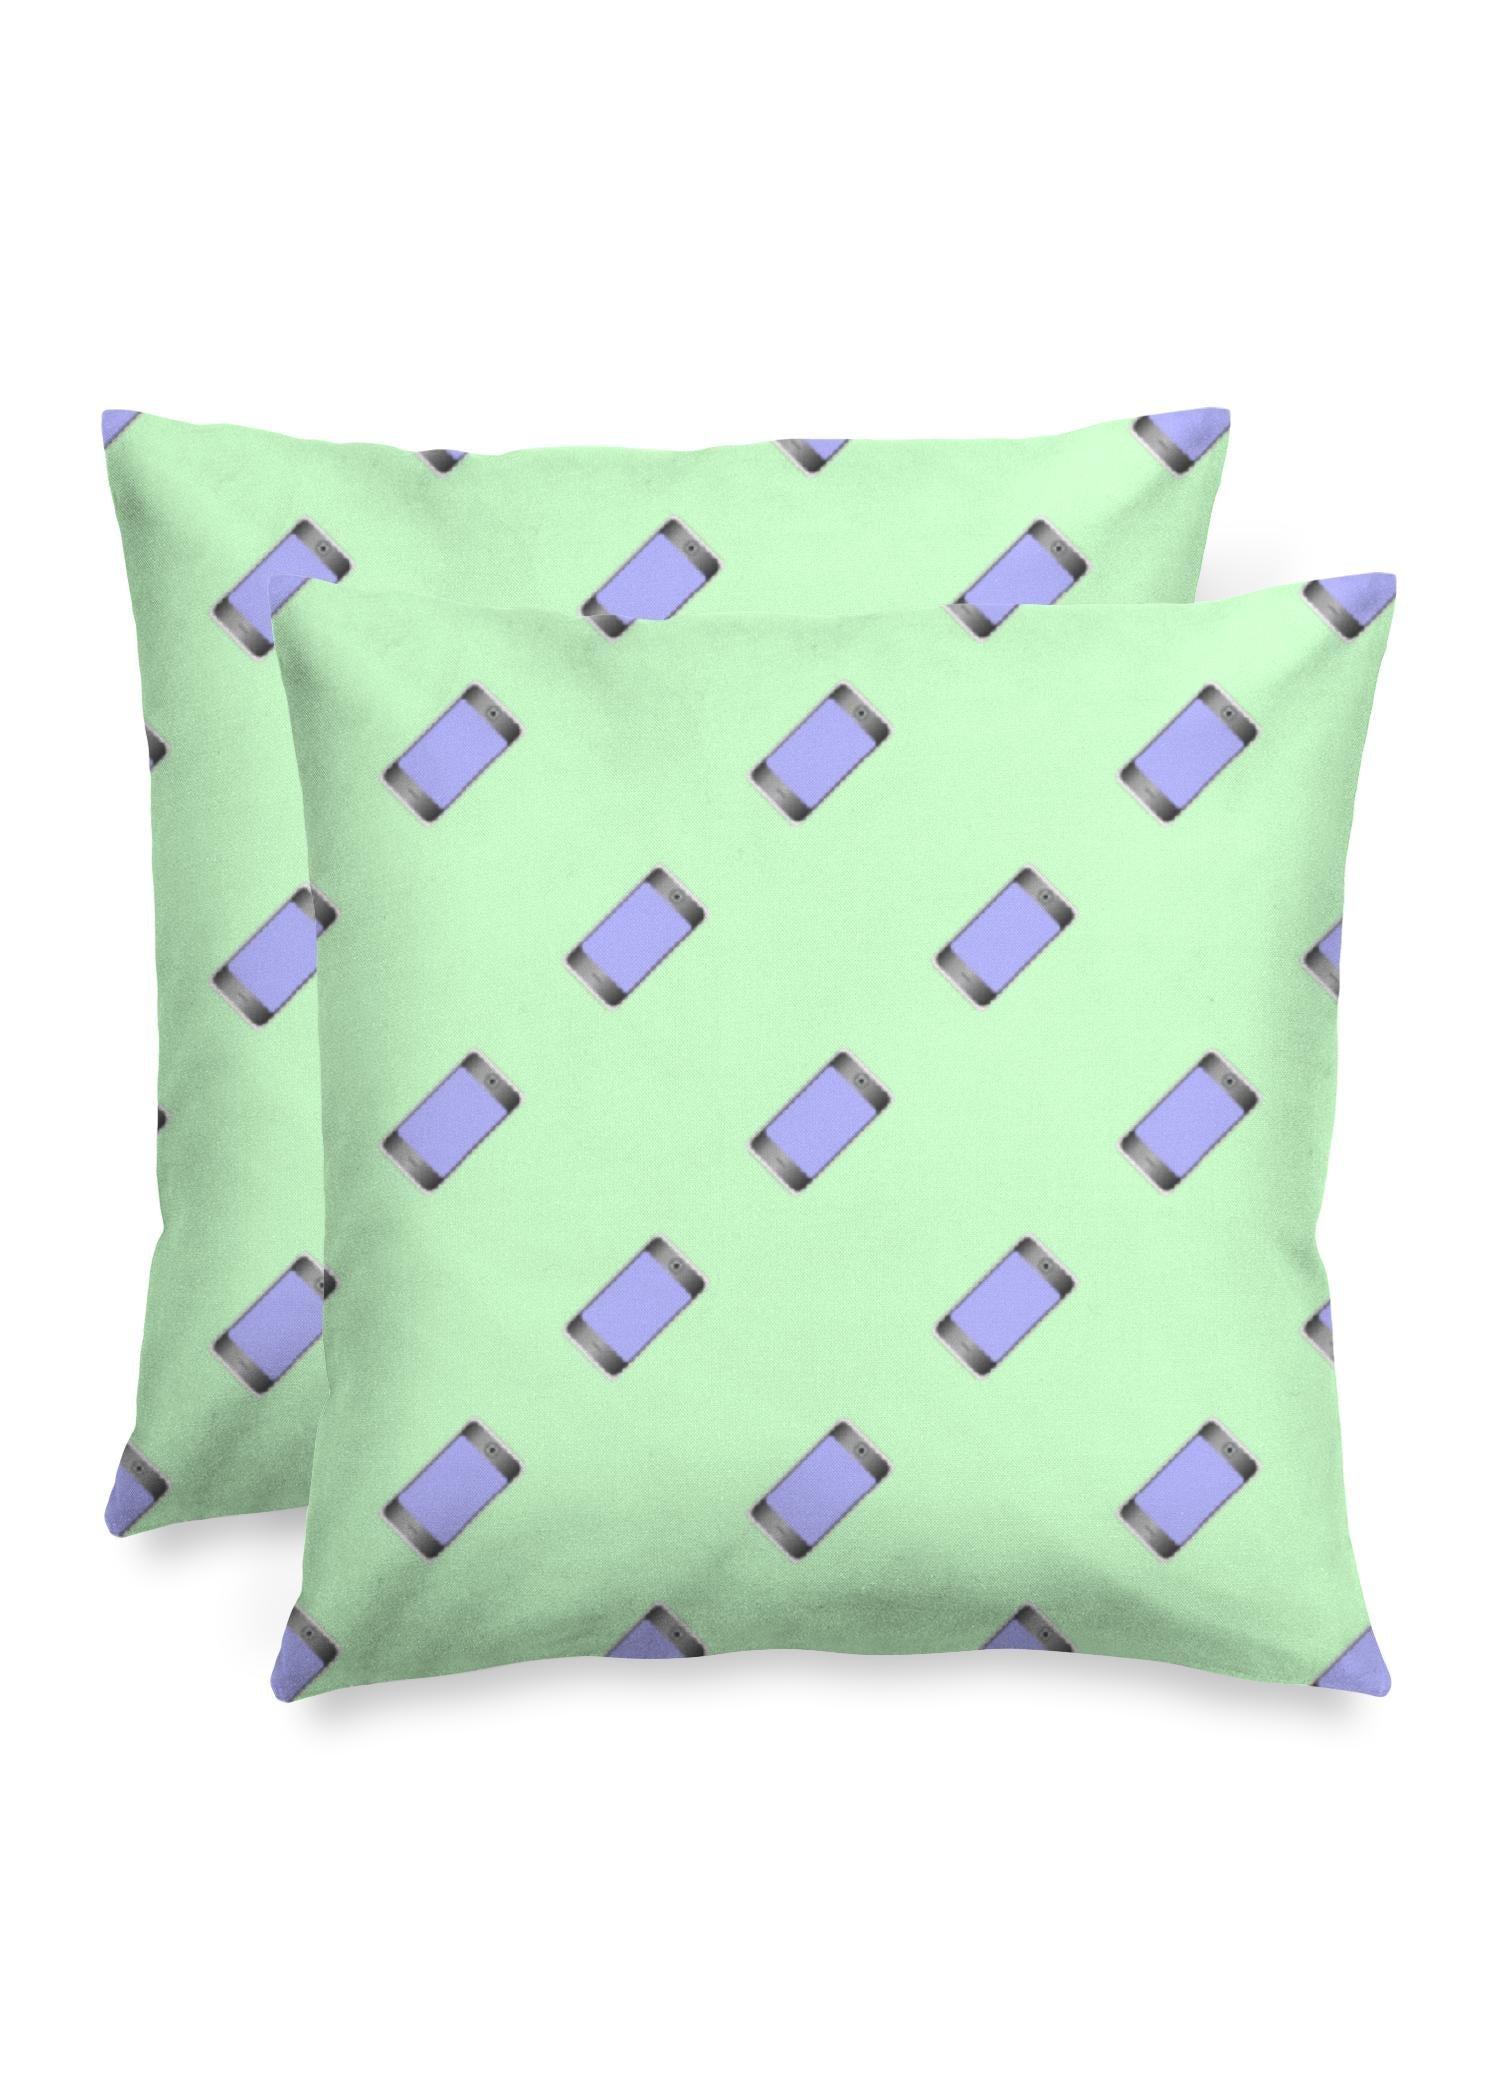 "VIDA Square Pillow - Mobile Phones On Green in Green by VIDA Original Artist  - Size: Luster / 16"" / Single"